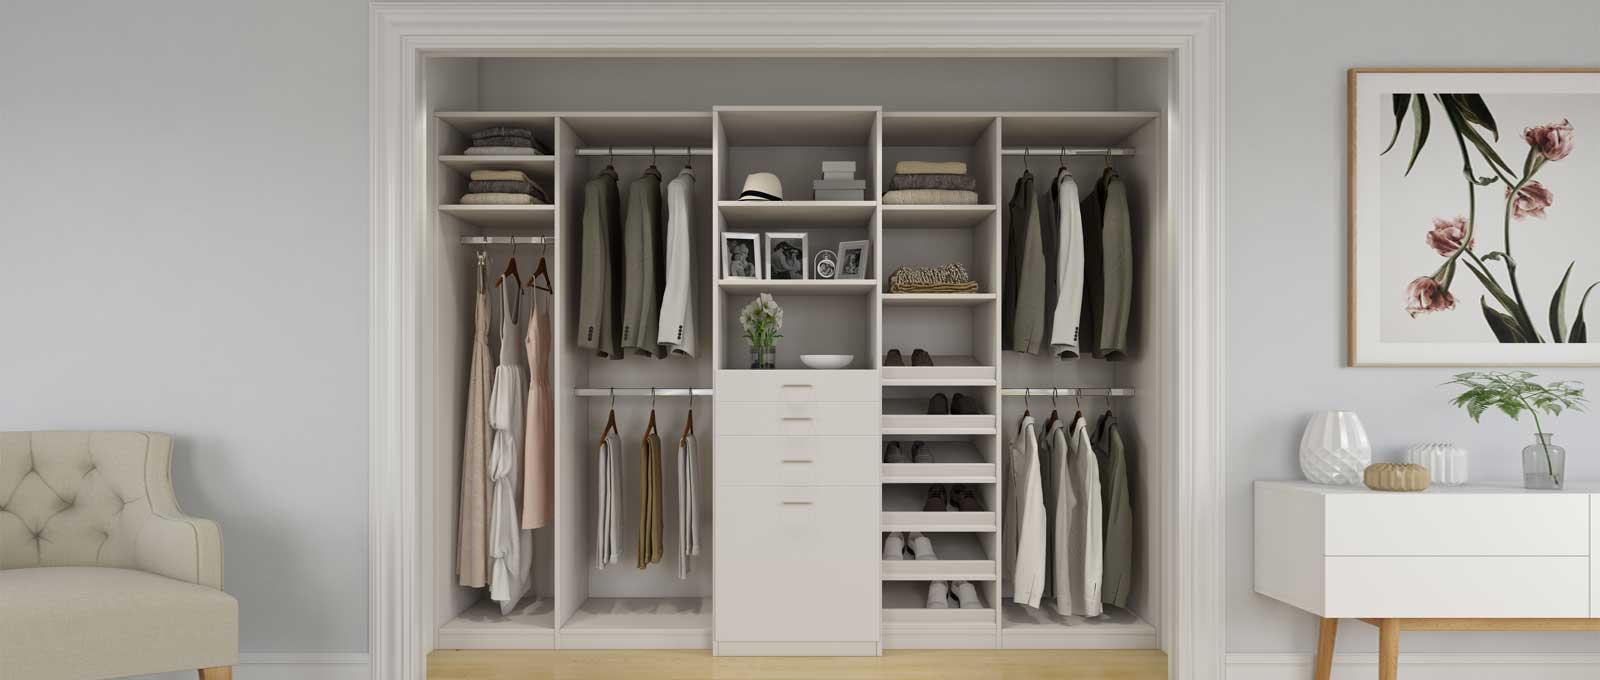 Custom Bedroom Closets And Closet Systems Closet World